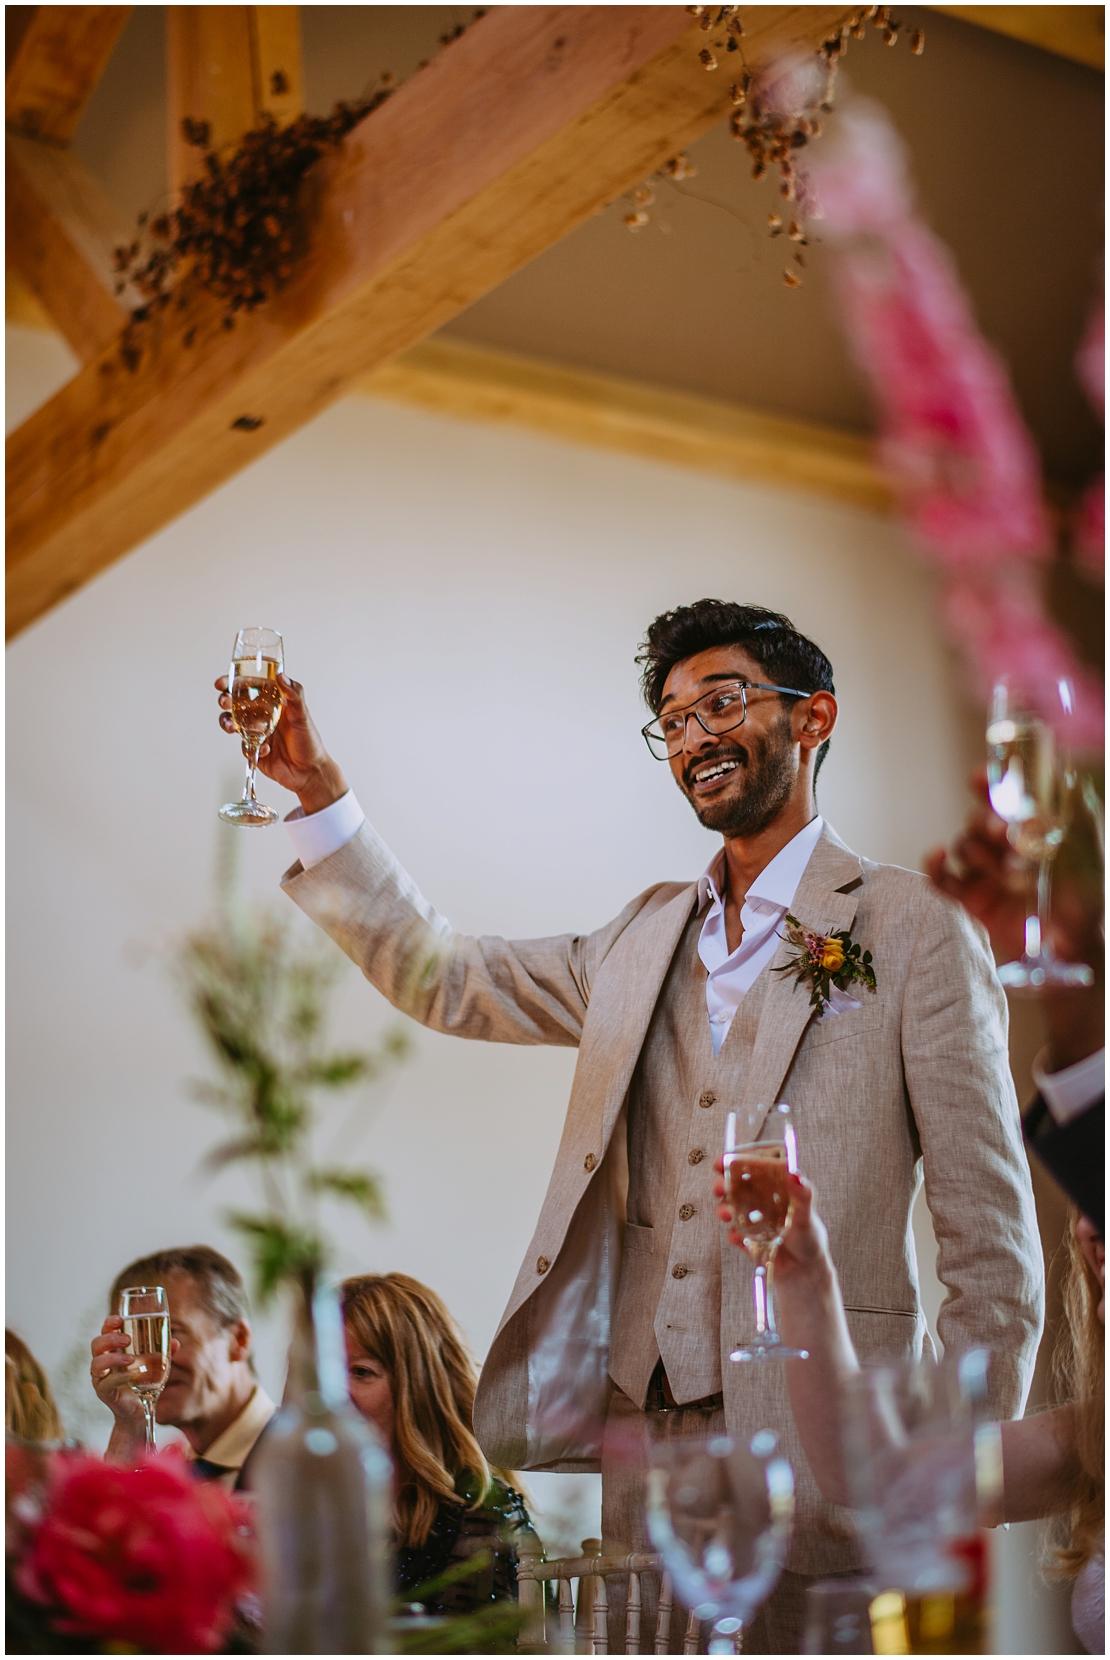 doxford barns wedding photography katie vivek 0086